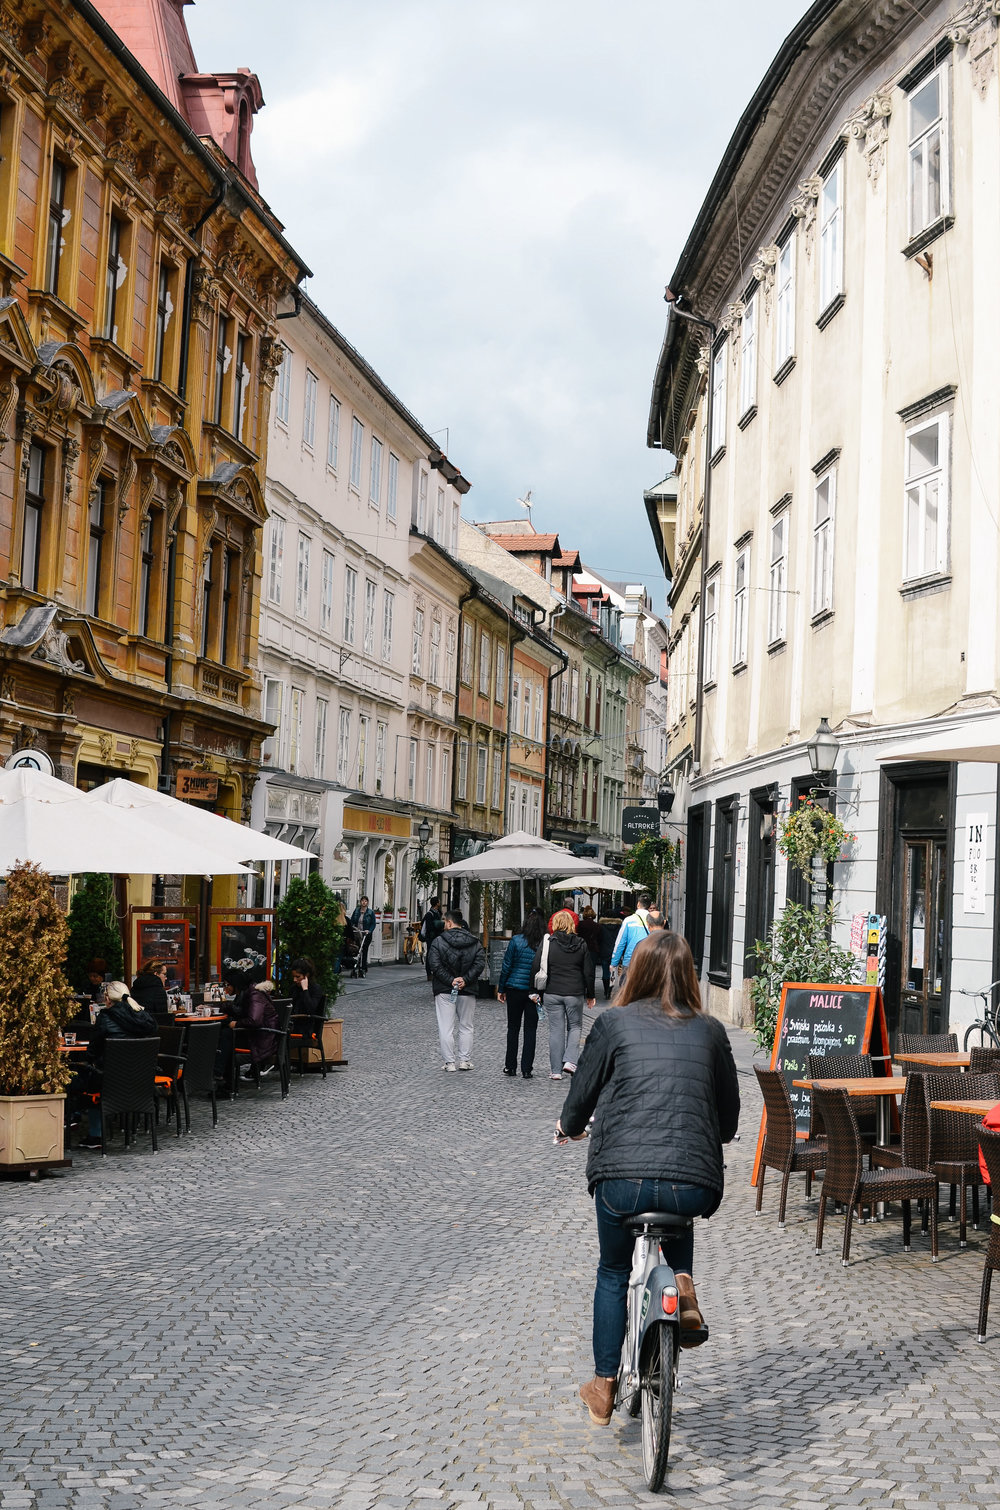 ljubljana-slovenia-travel-guide-lifeonpine_DSC_1748.jpg